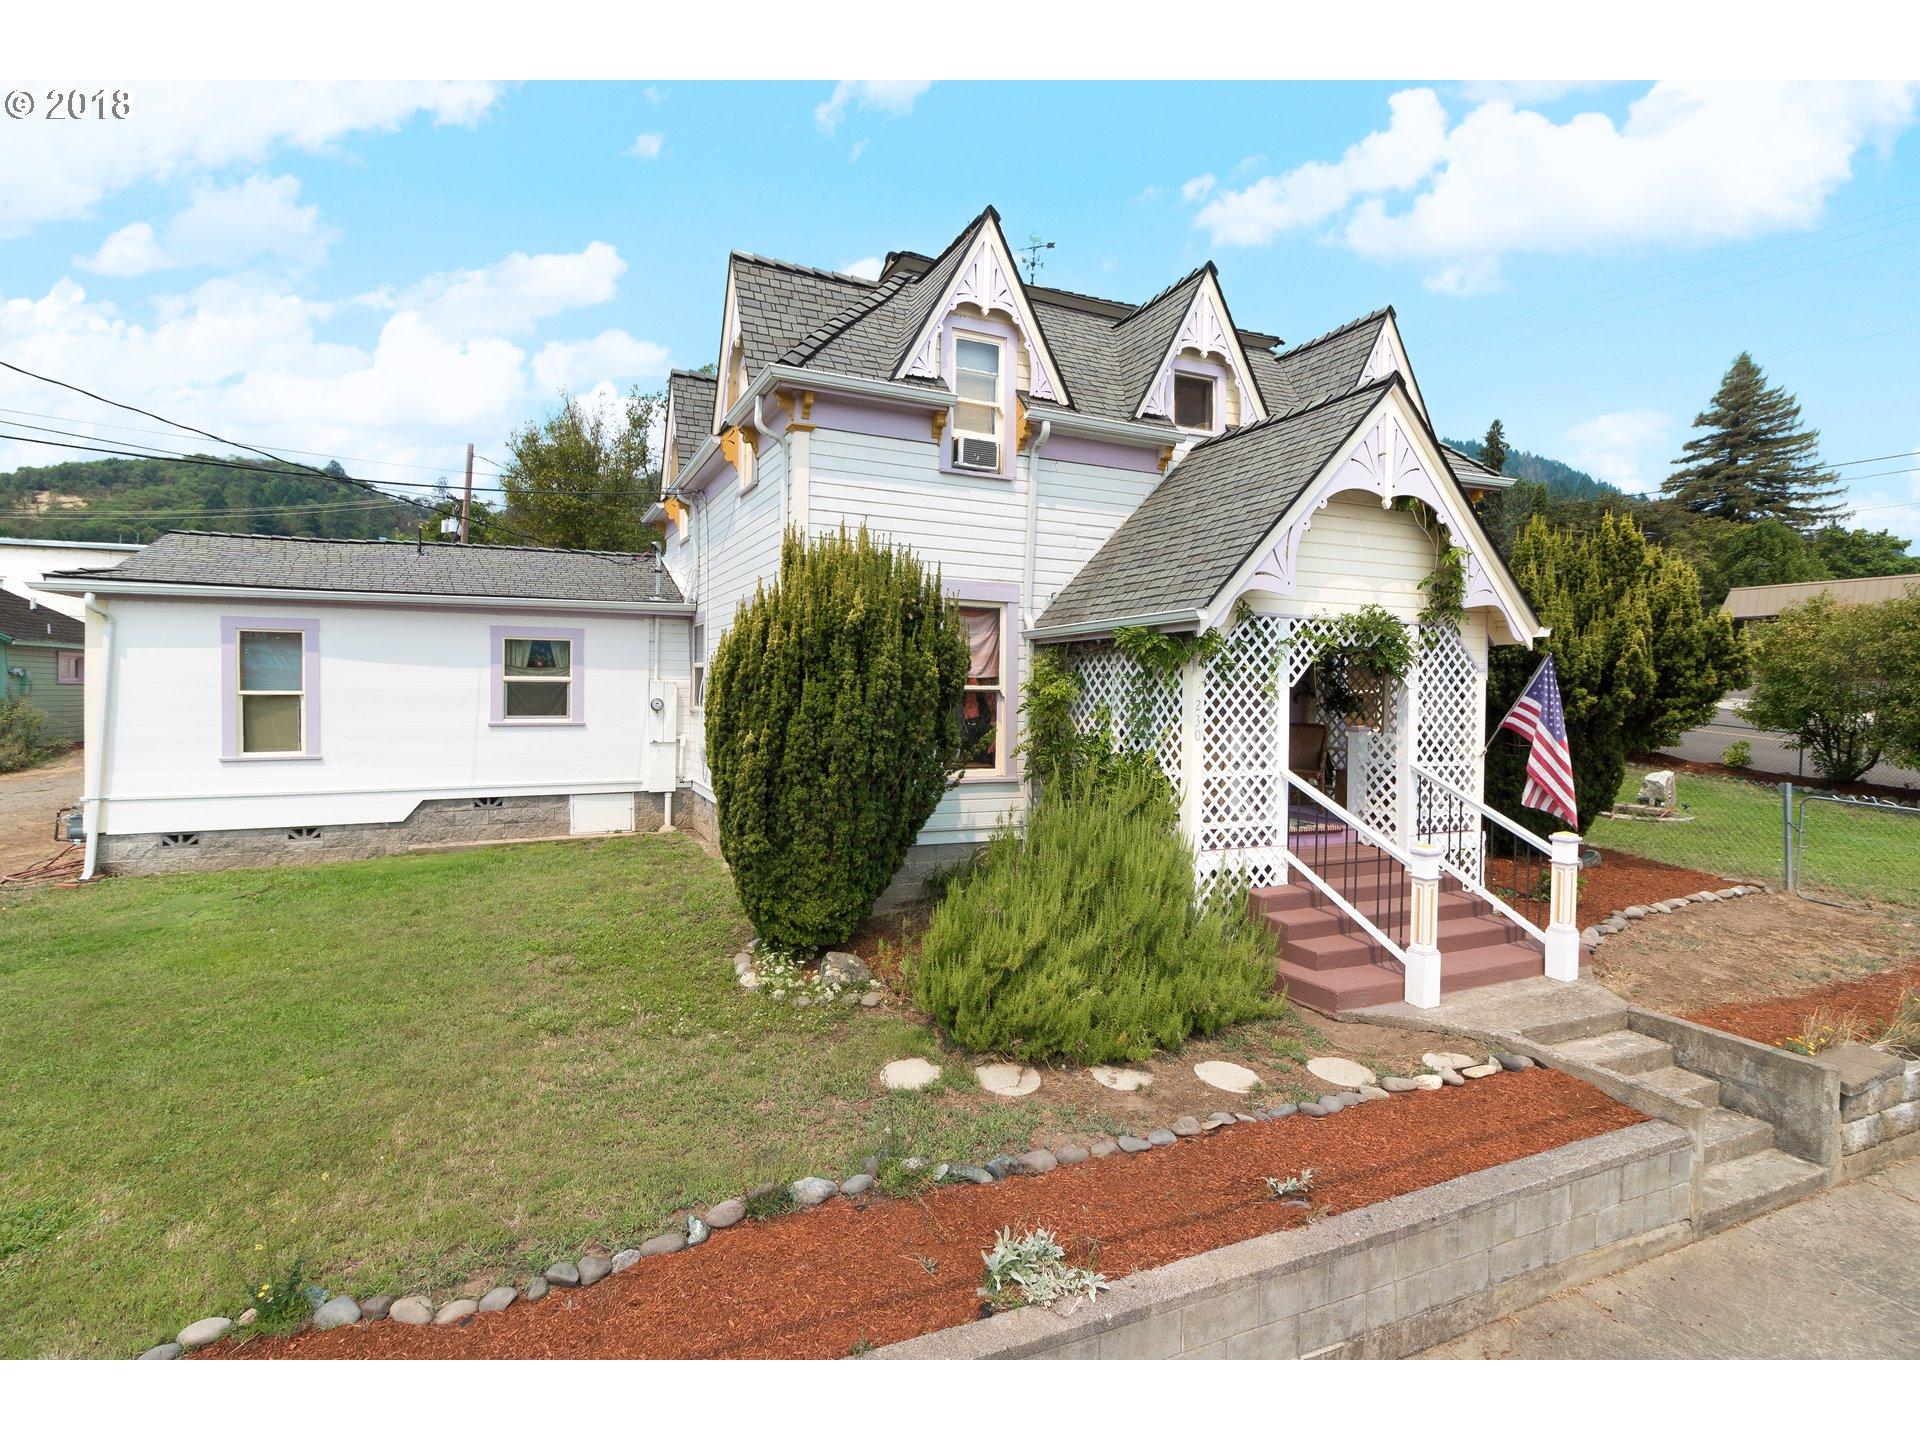 Roseburg, OR 6 Bedroom Home For Sale